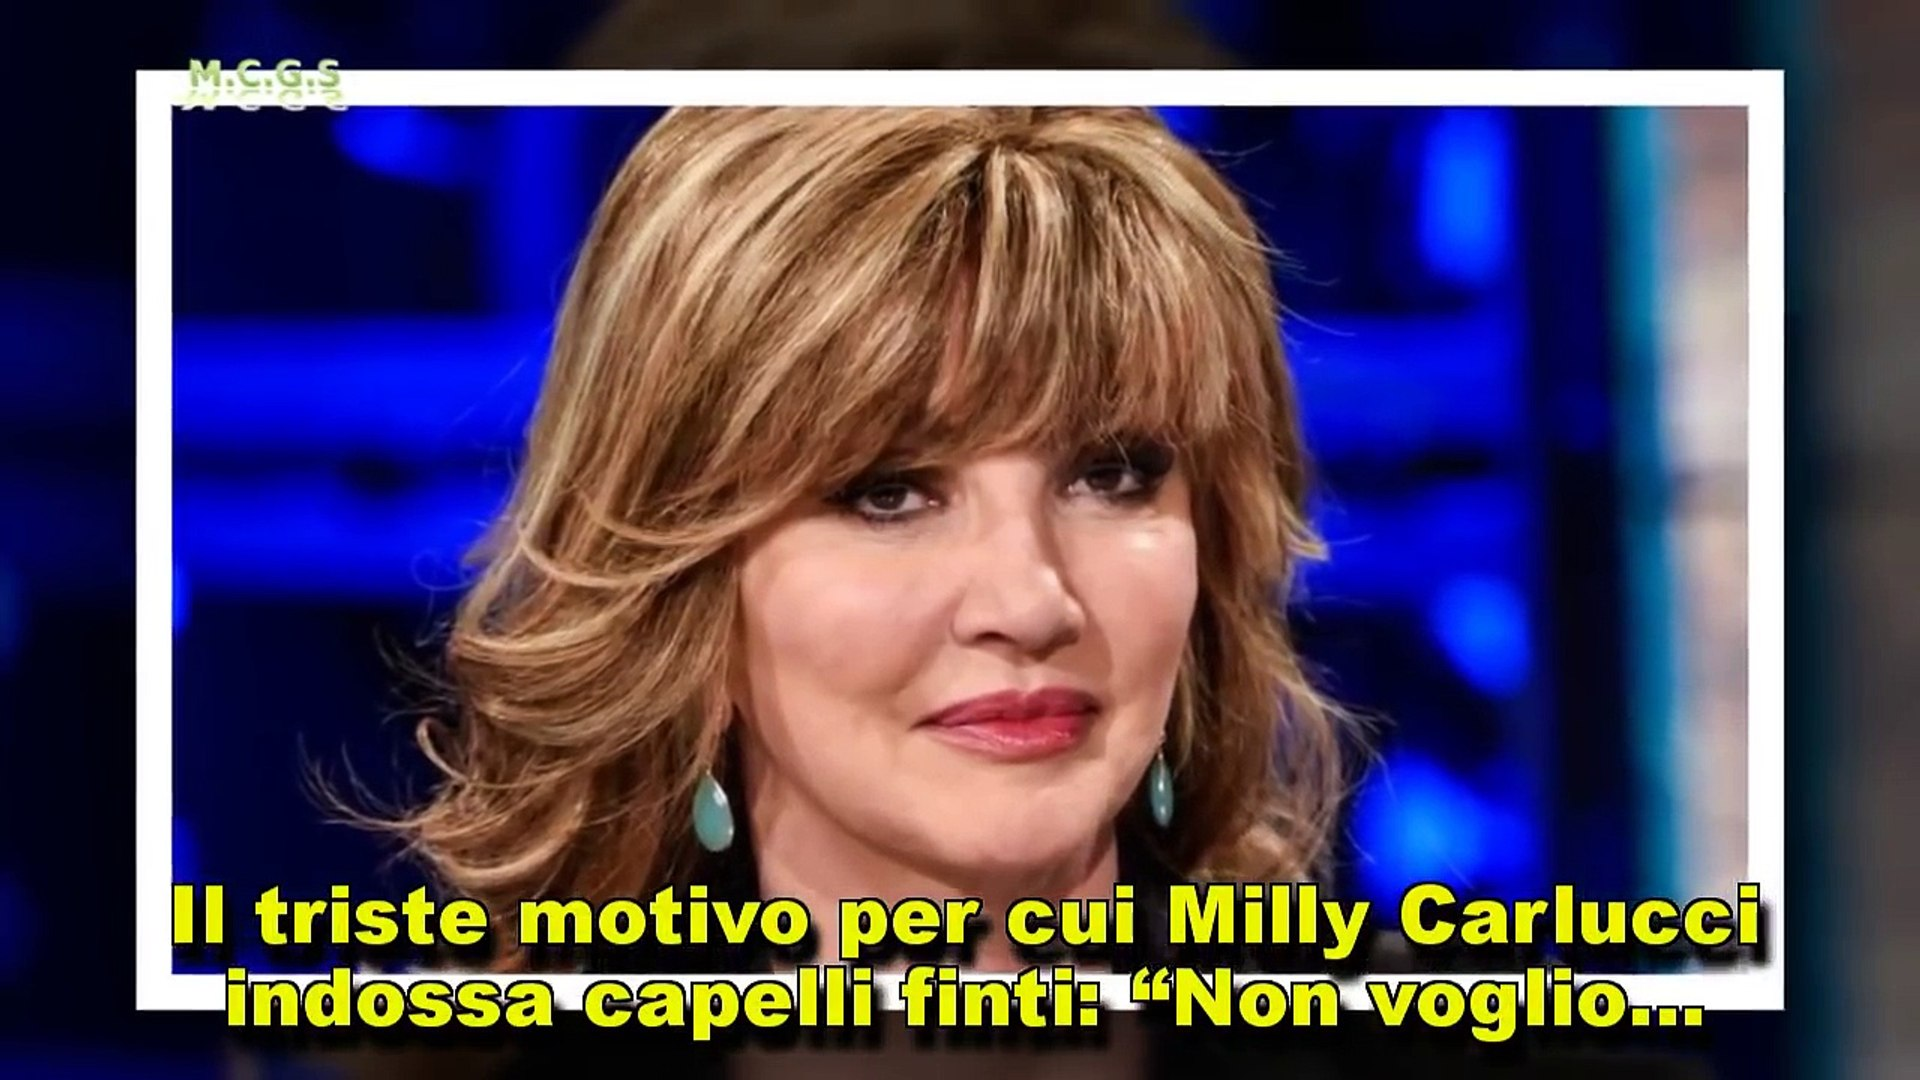 capelli milly carlucci